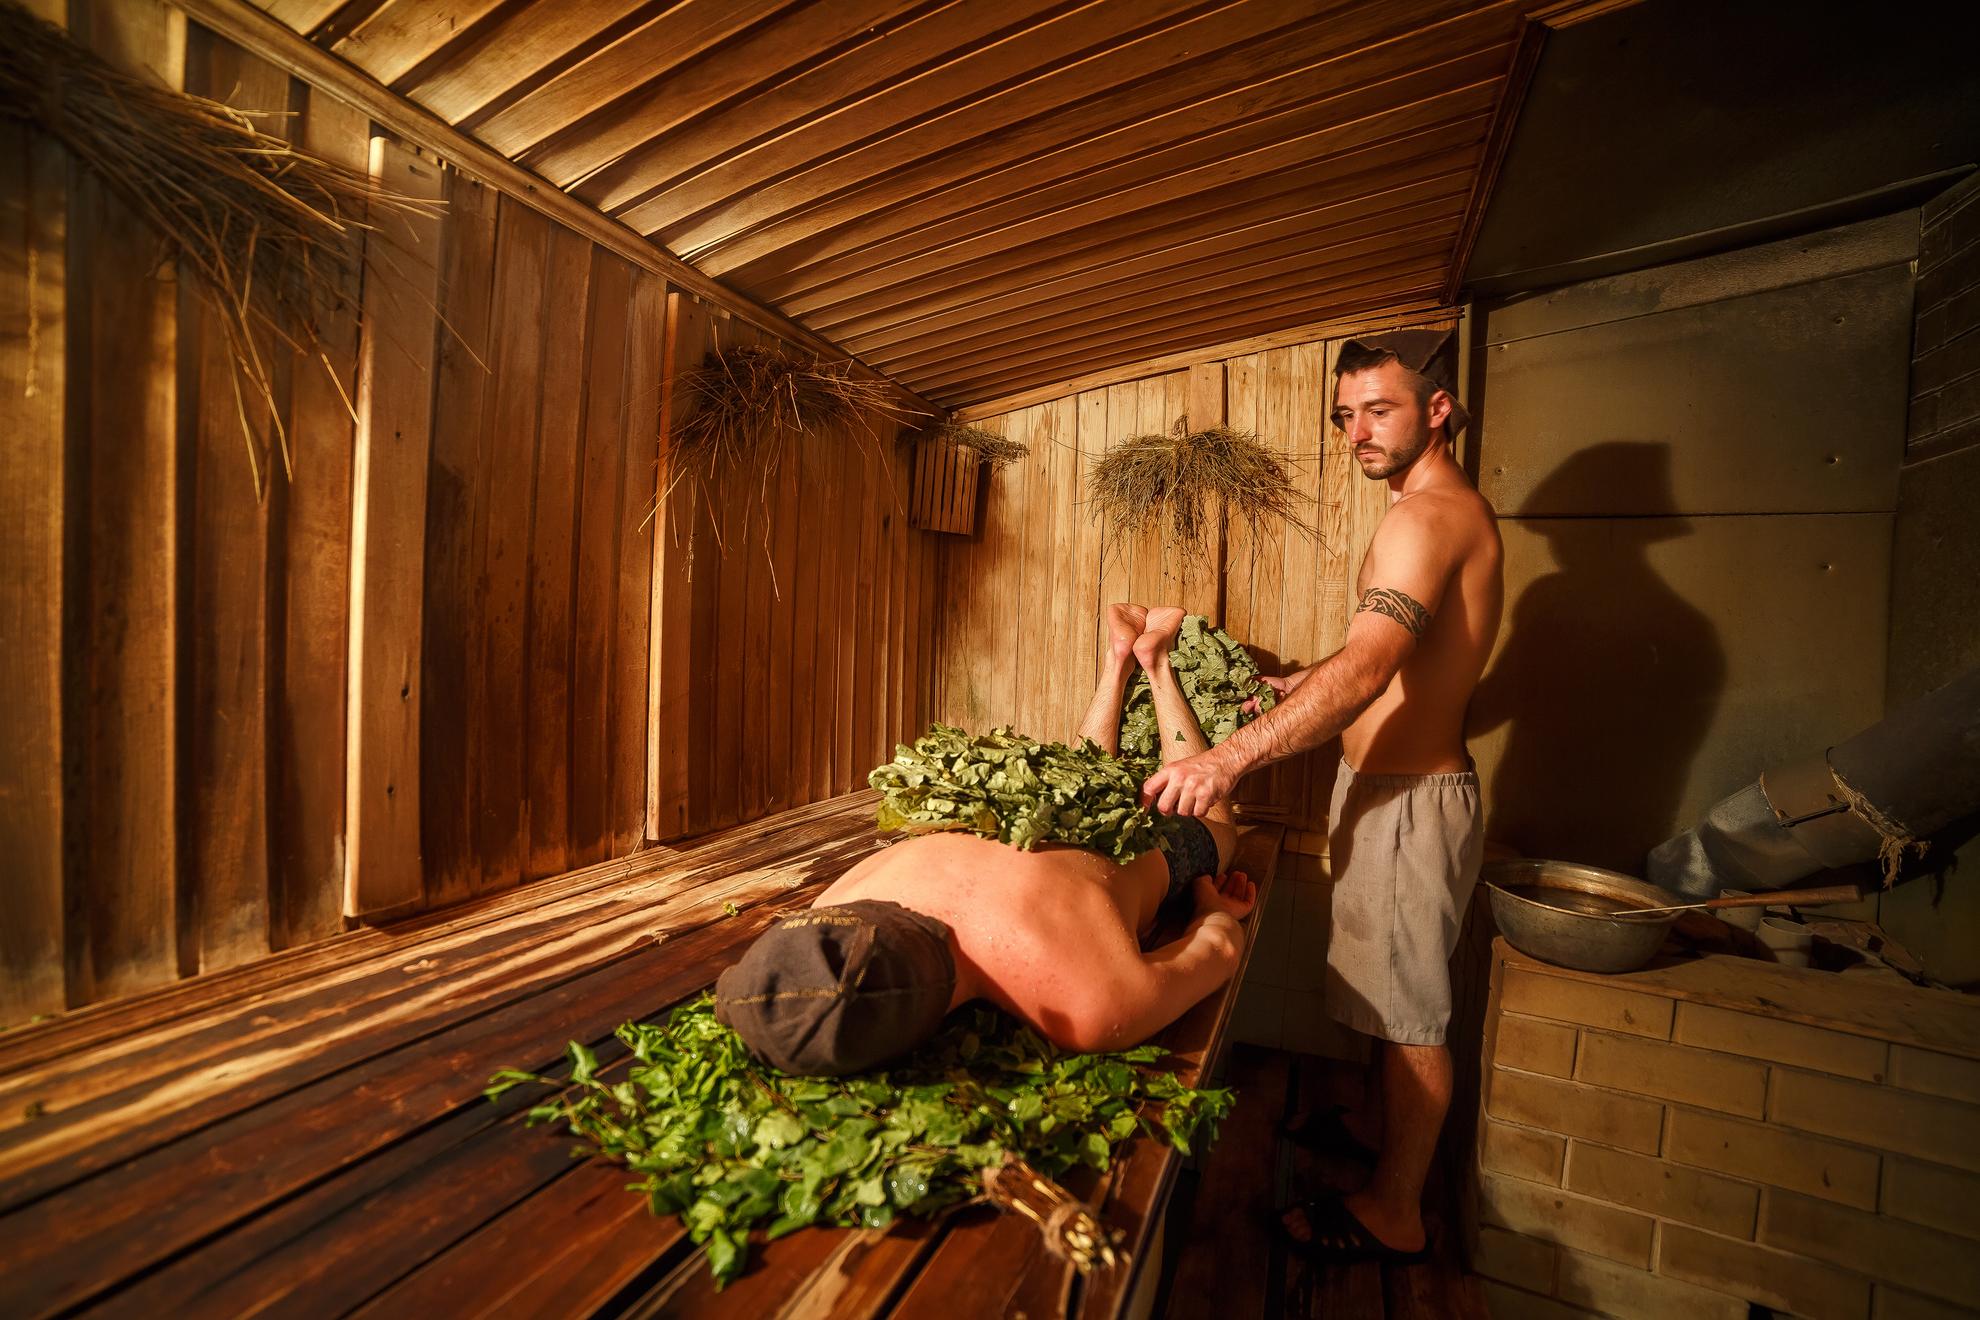 Деревянная баня под ключ: можно ли париться сразу? | банька